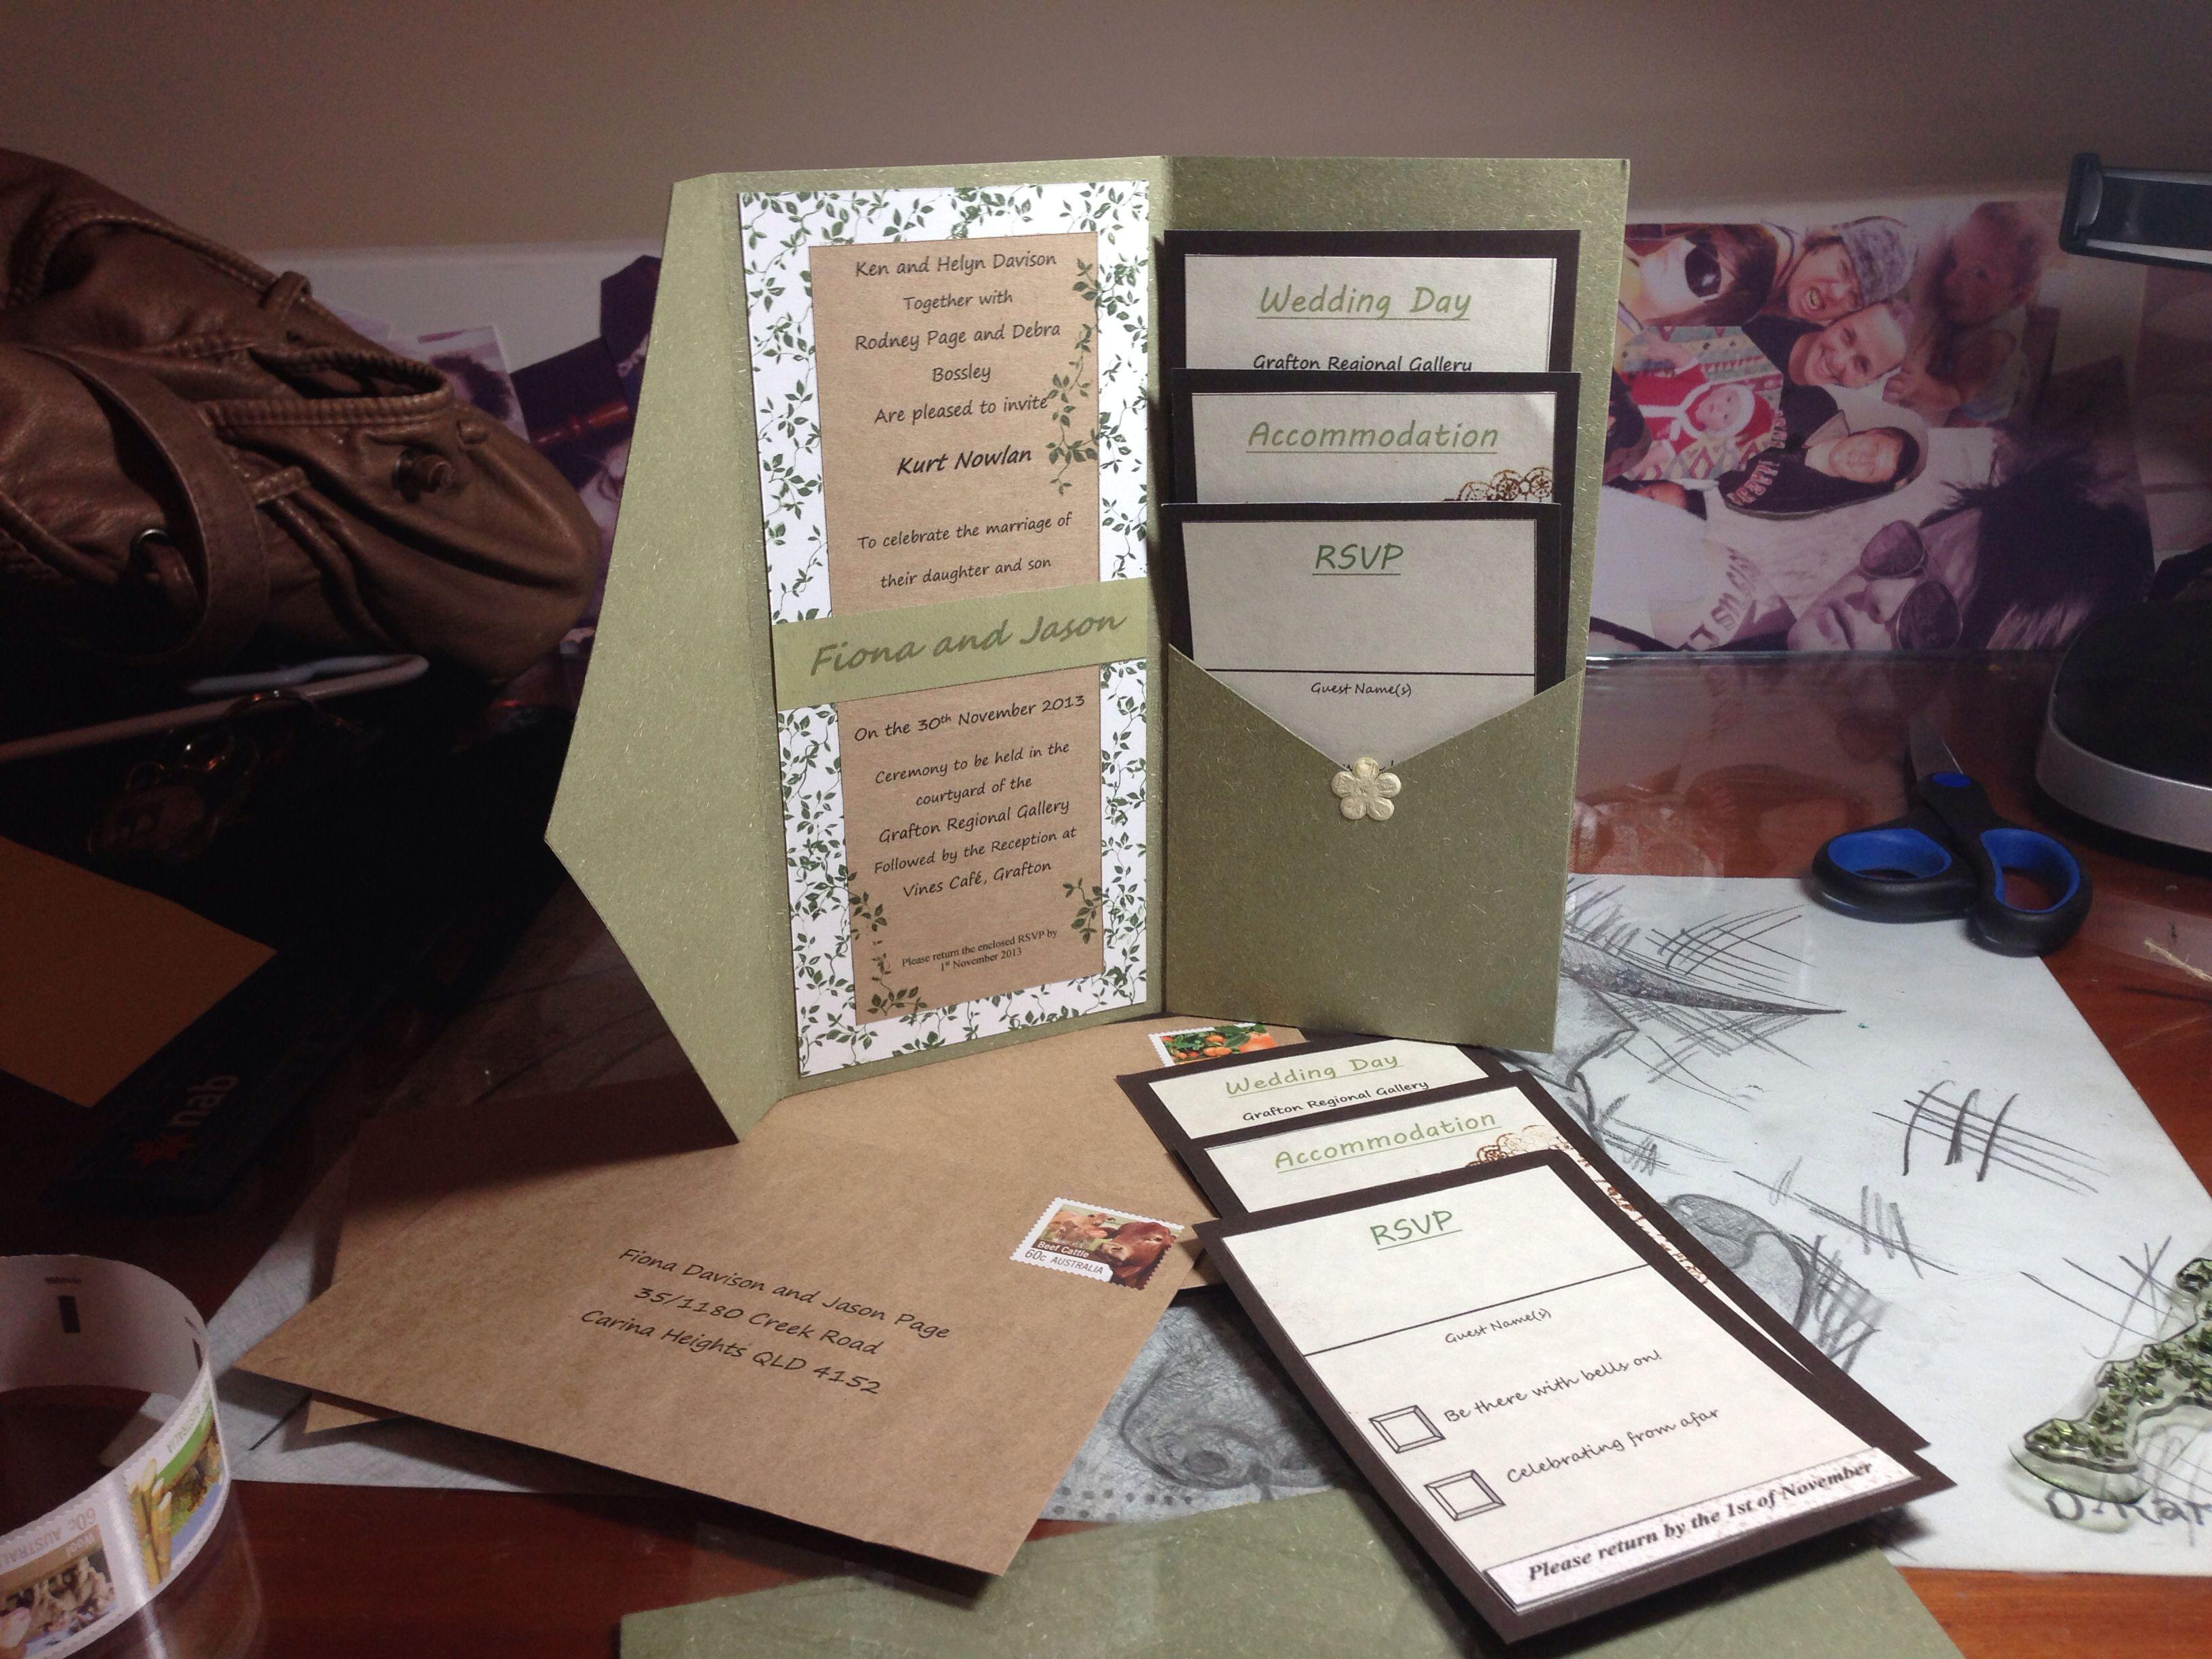 Garden theme wedding invitations diy recycled paper home made garden theme wedding invitations diy recycled paper home made created from scratch myself for my solutioingenieria Gallery